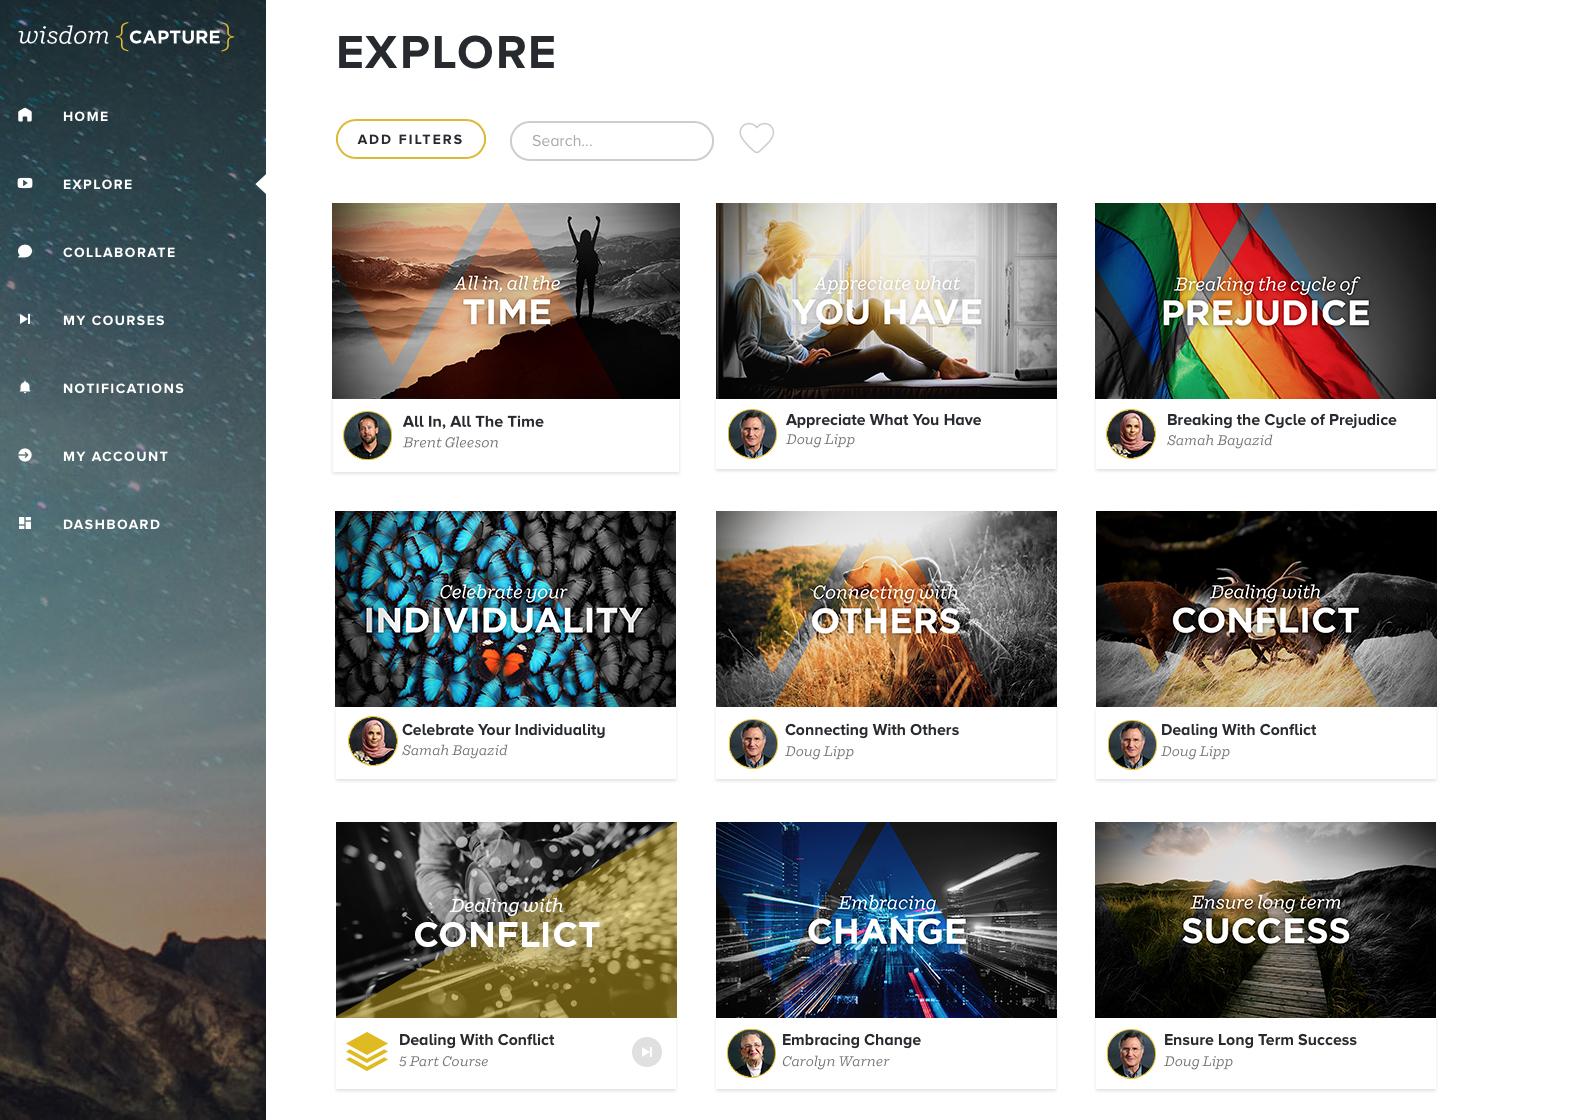 Explore_update2.jpg